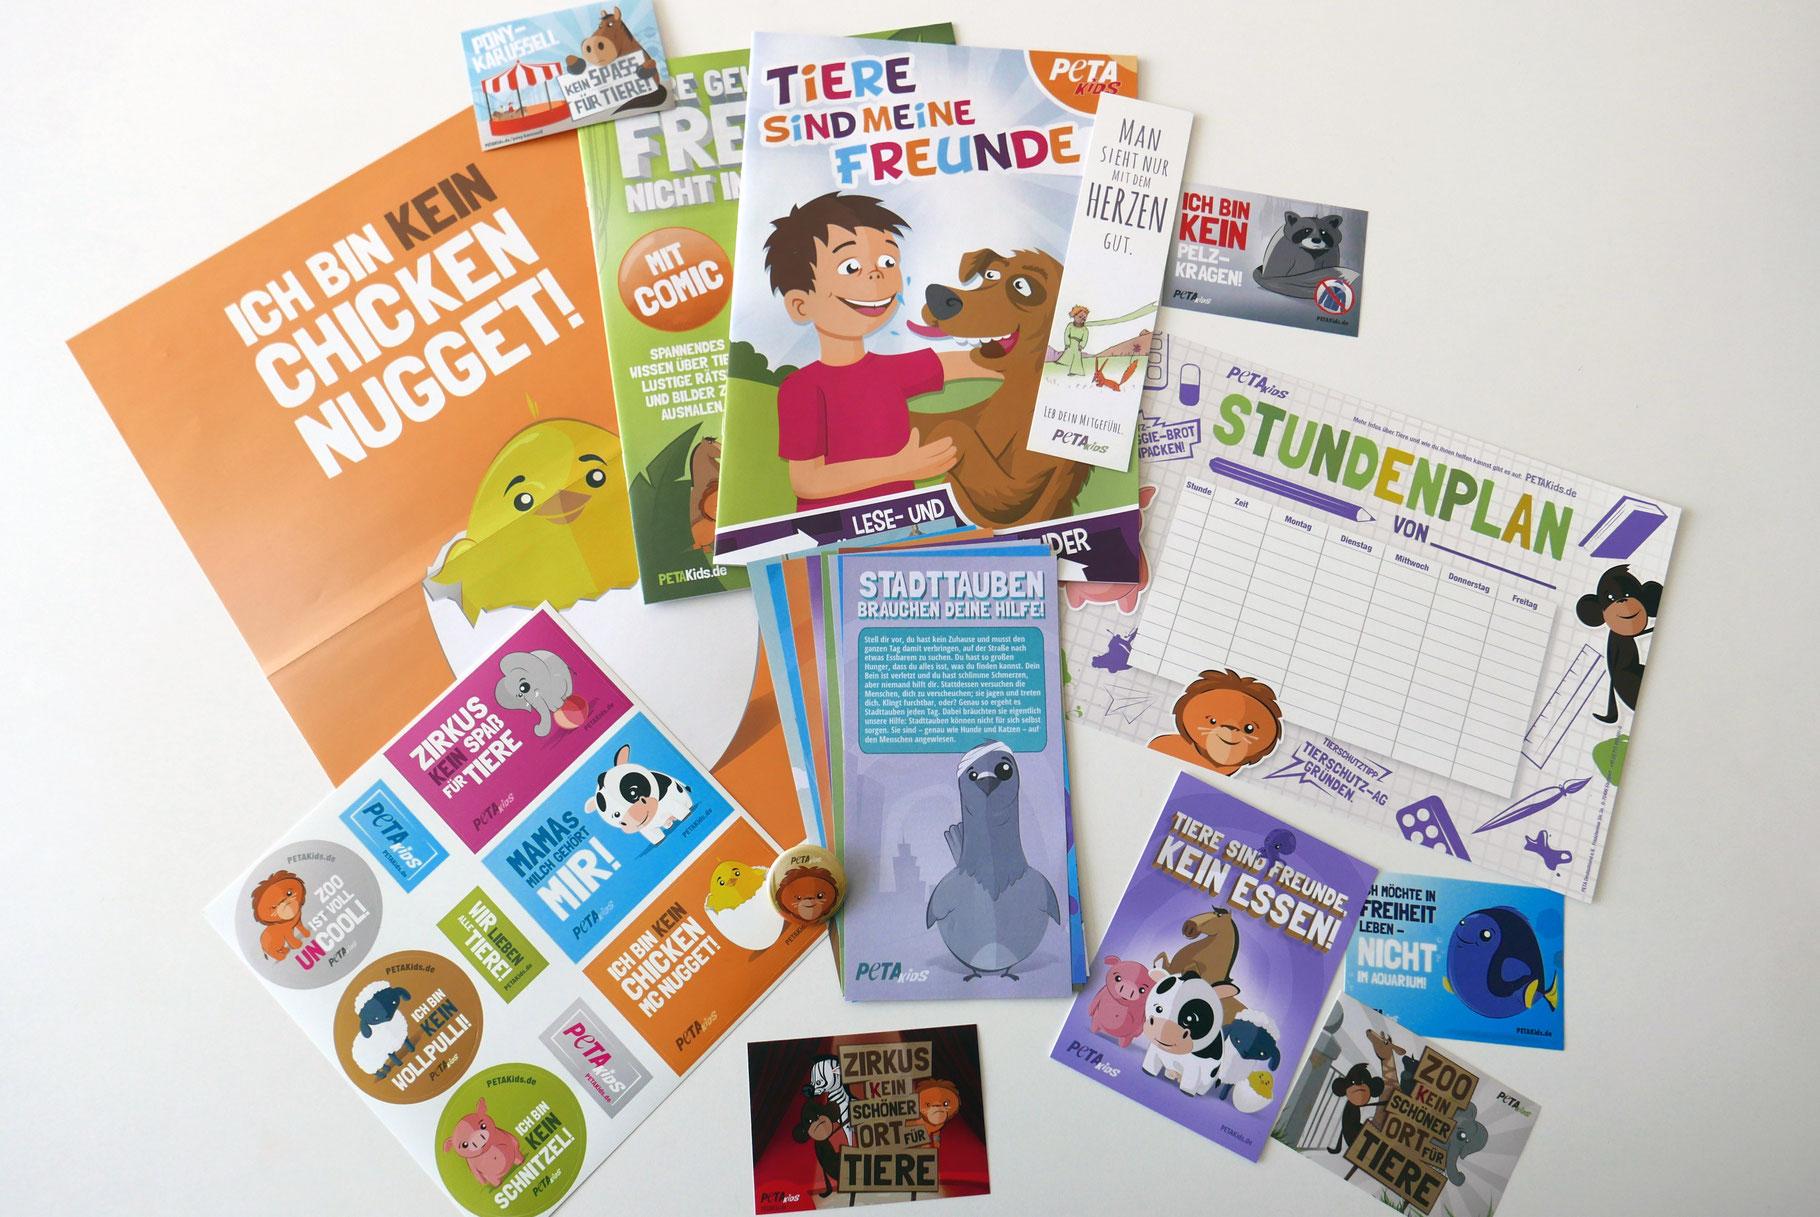 Umfangreiche Infomappe ( kindgerecht ) zum Thema Tierschutz (PetaKids)